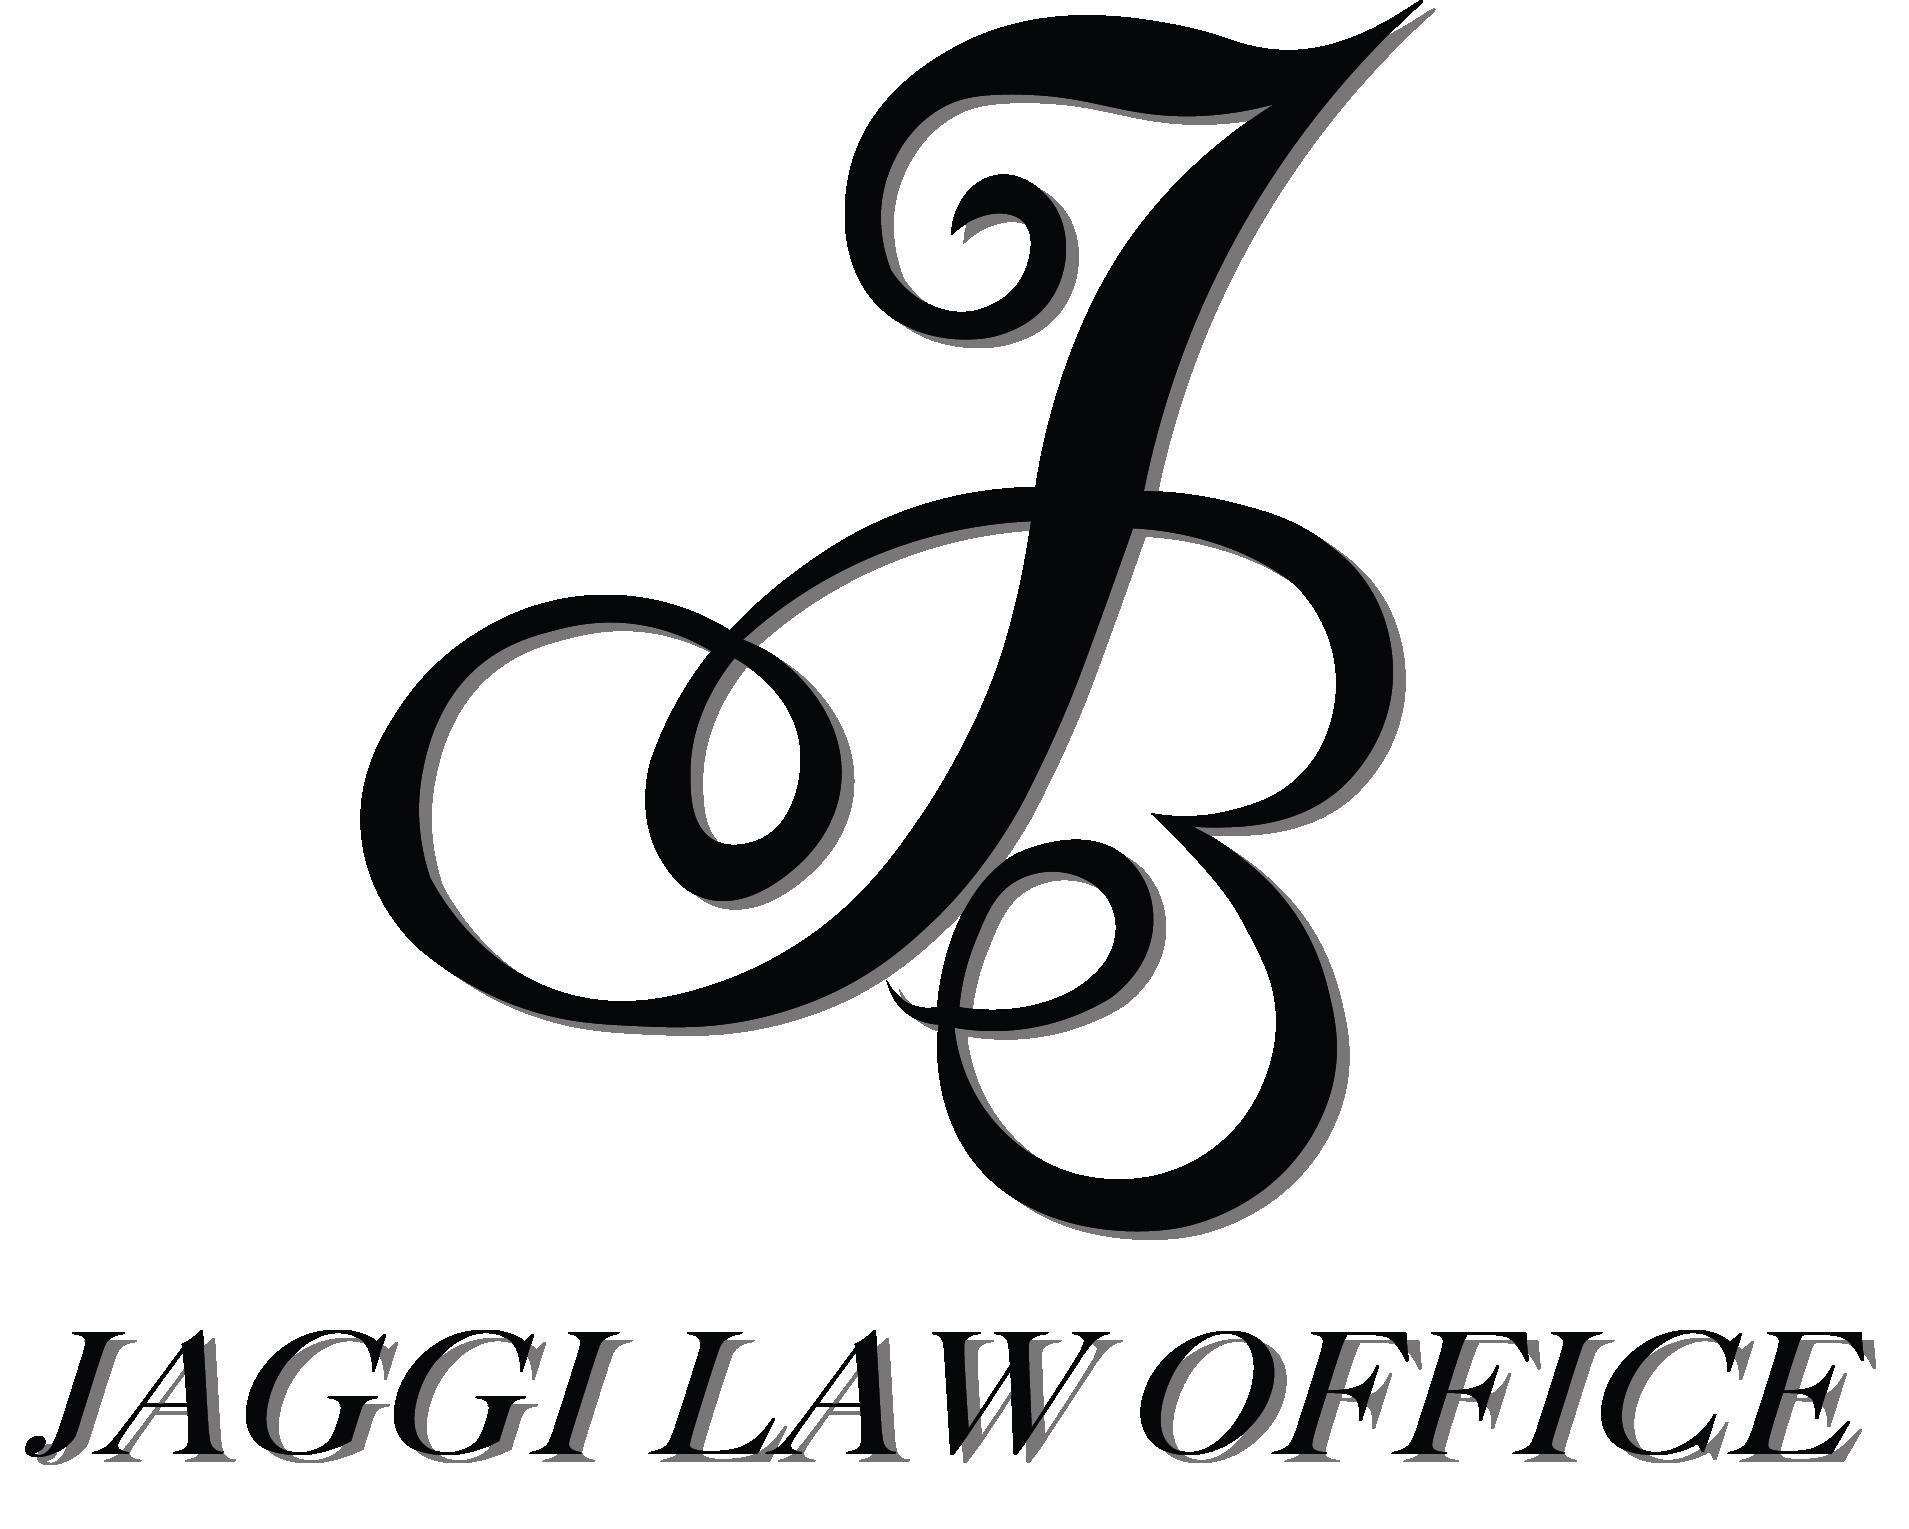 JAGGI LAW OFFICE